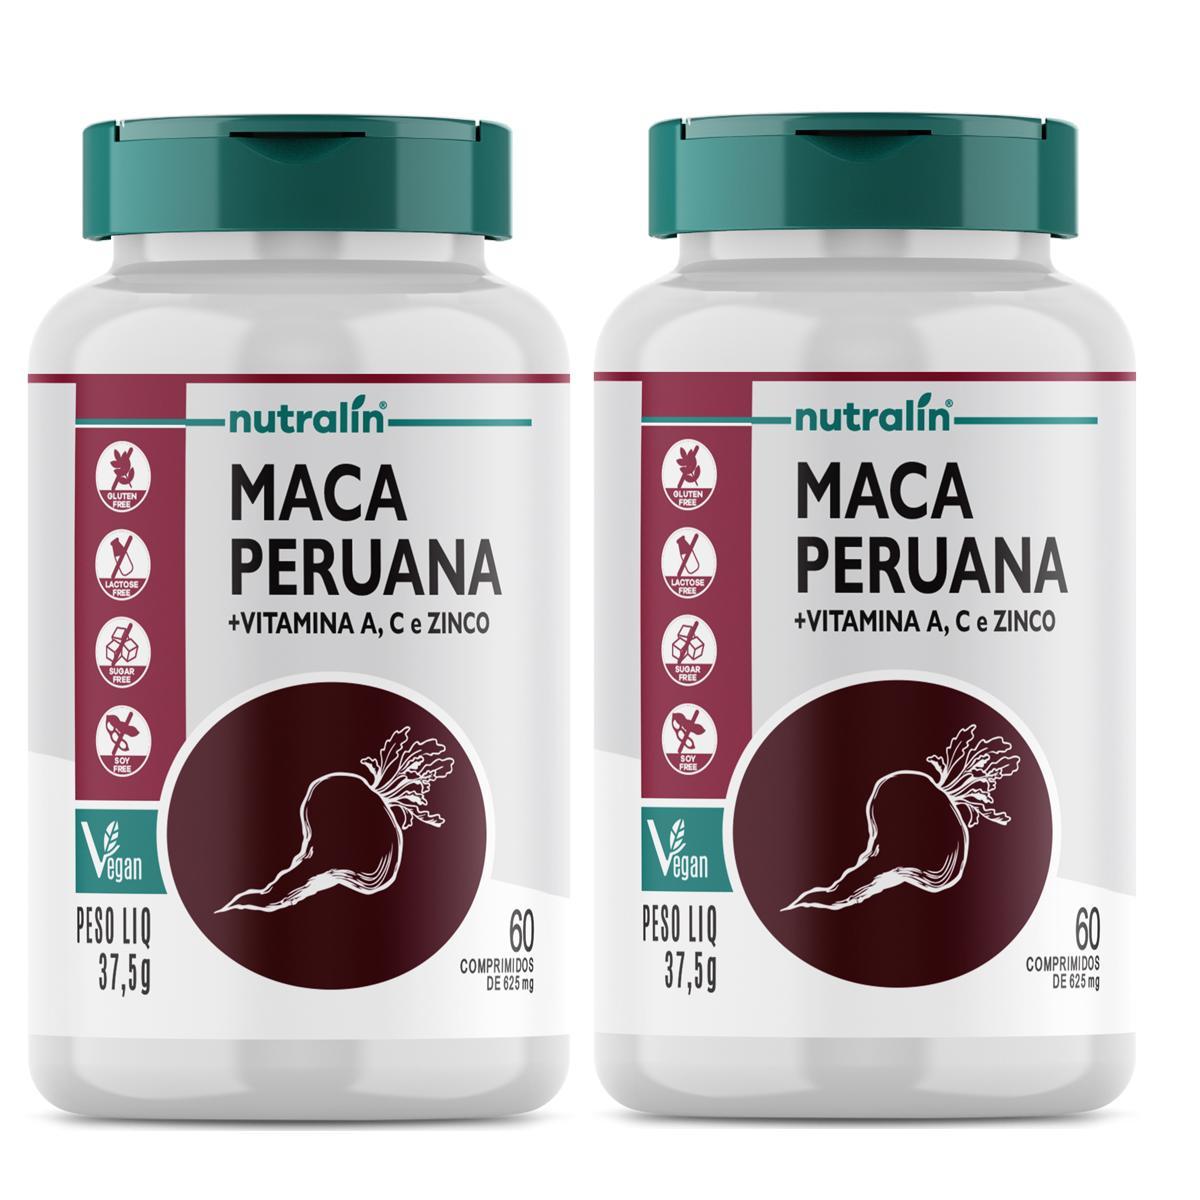 Kit Maca Peruana Nutralin c/60 cápsulas 2 potes